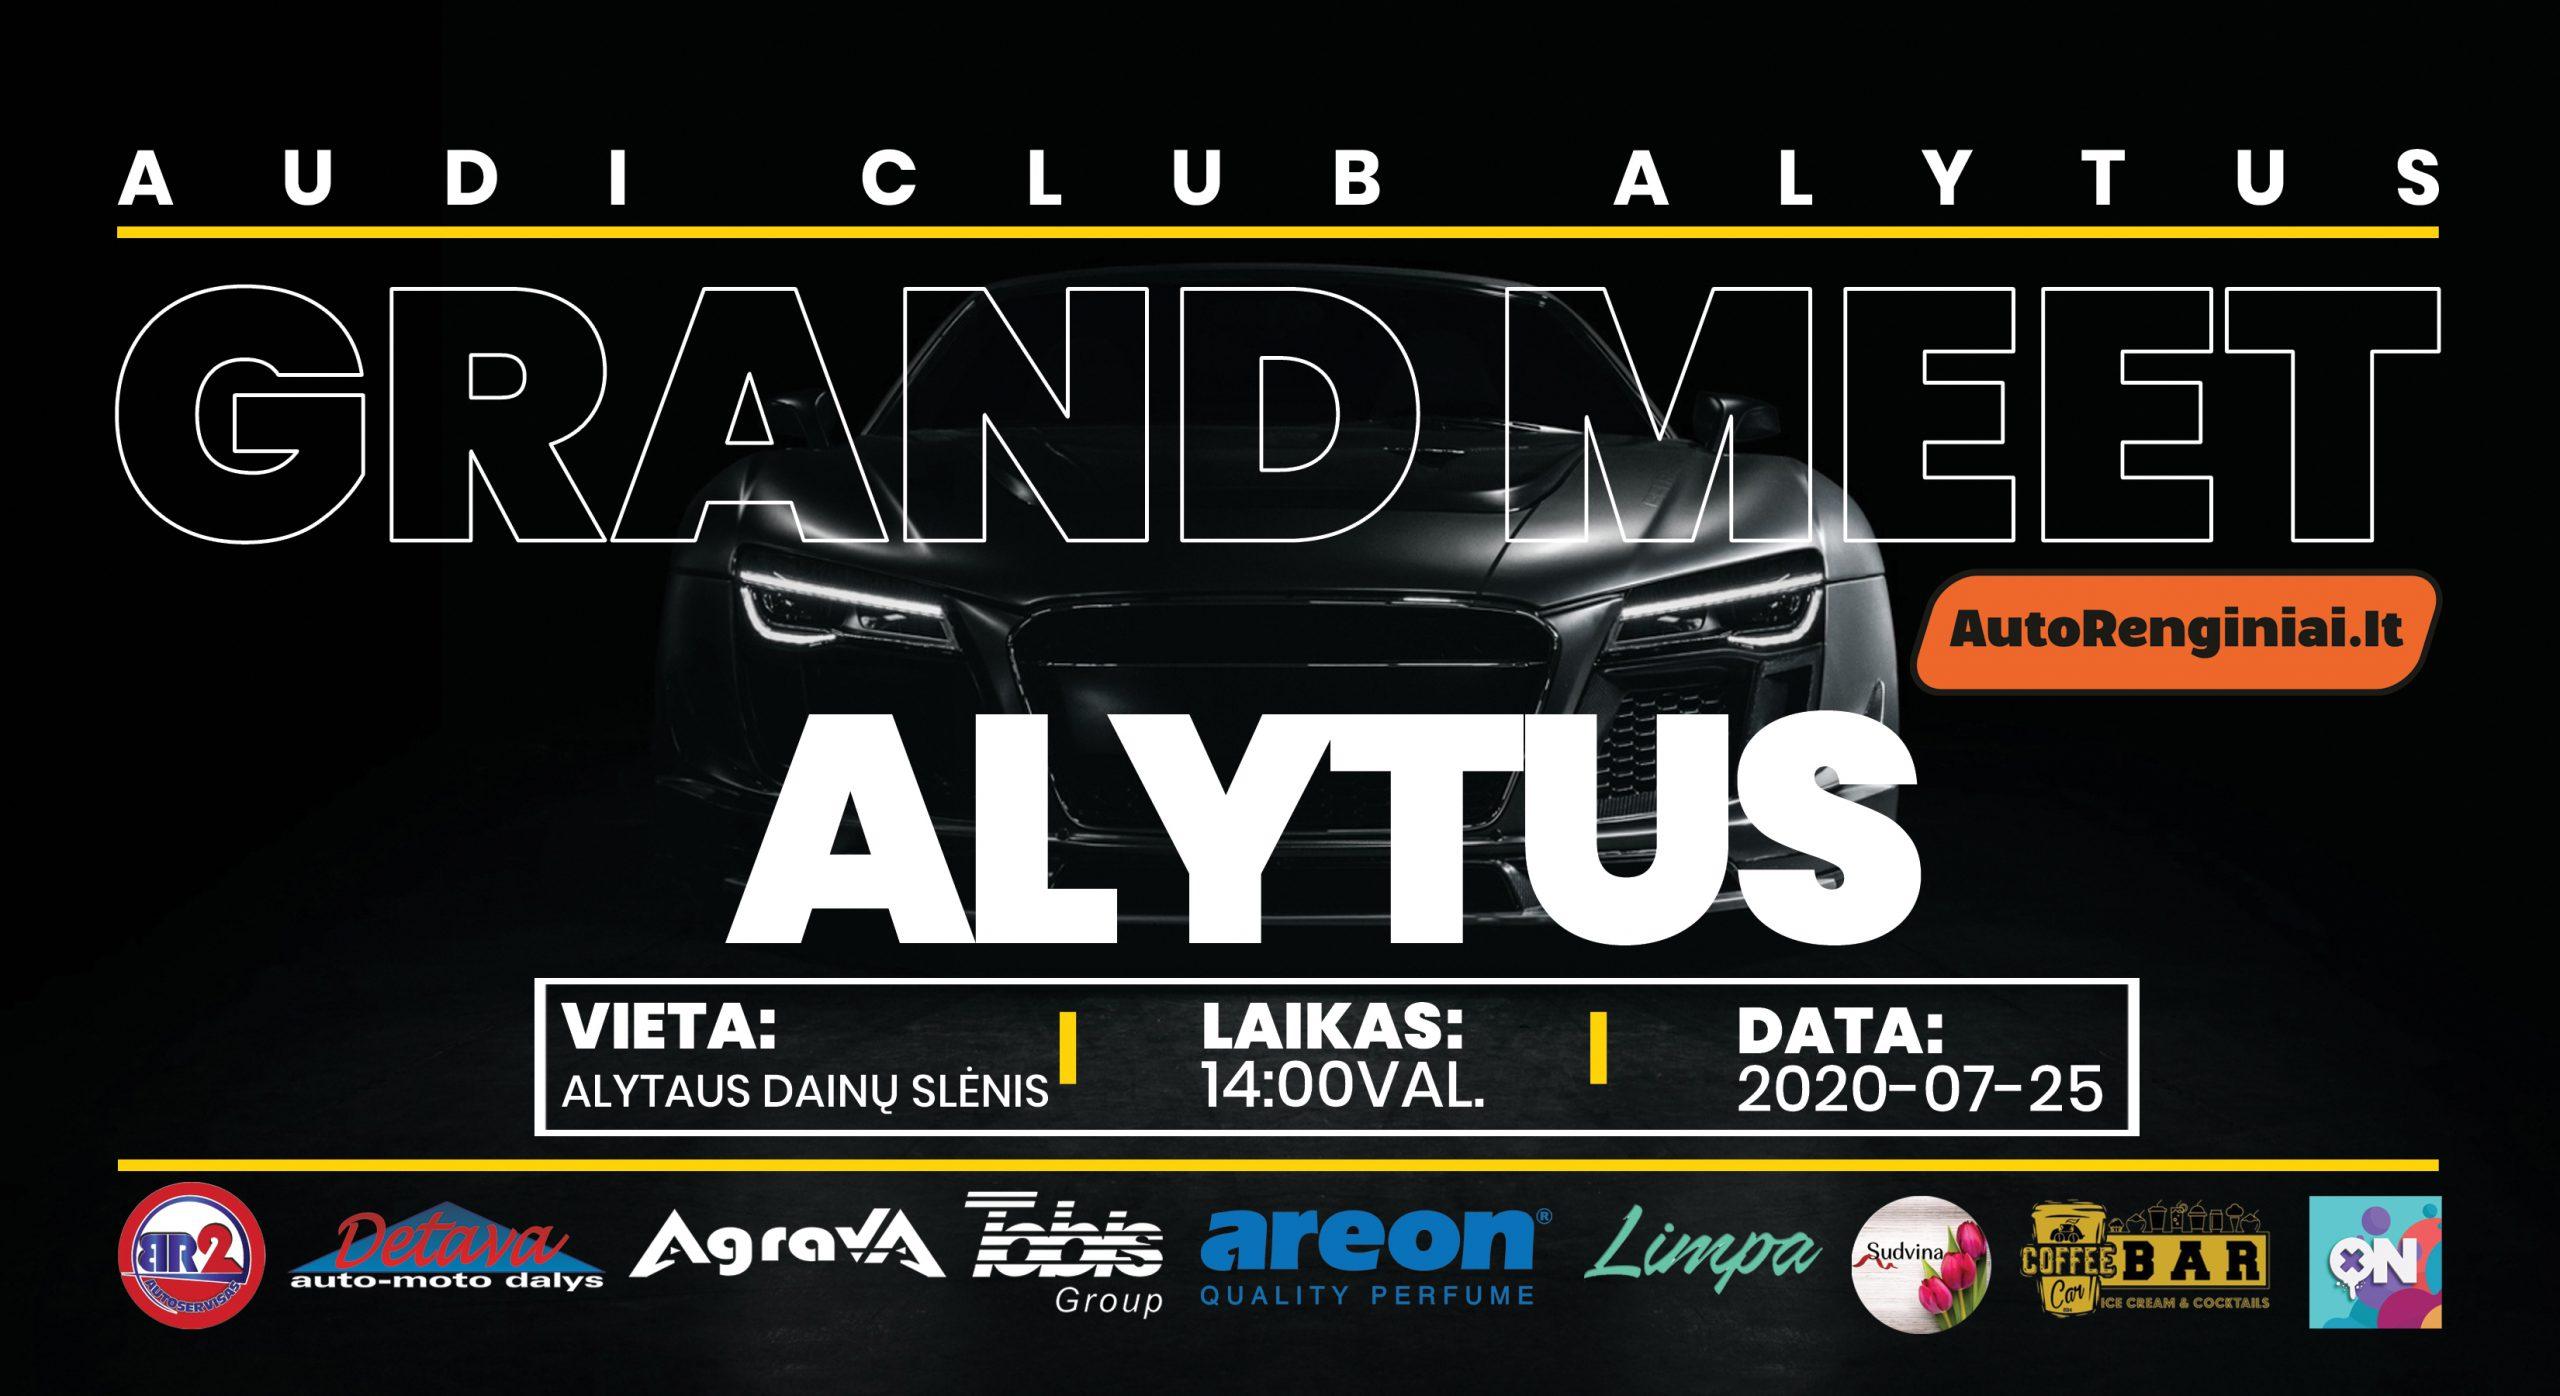 GRAND MEET Alytus 2020